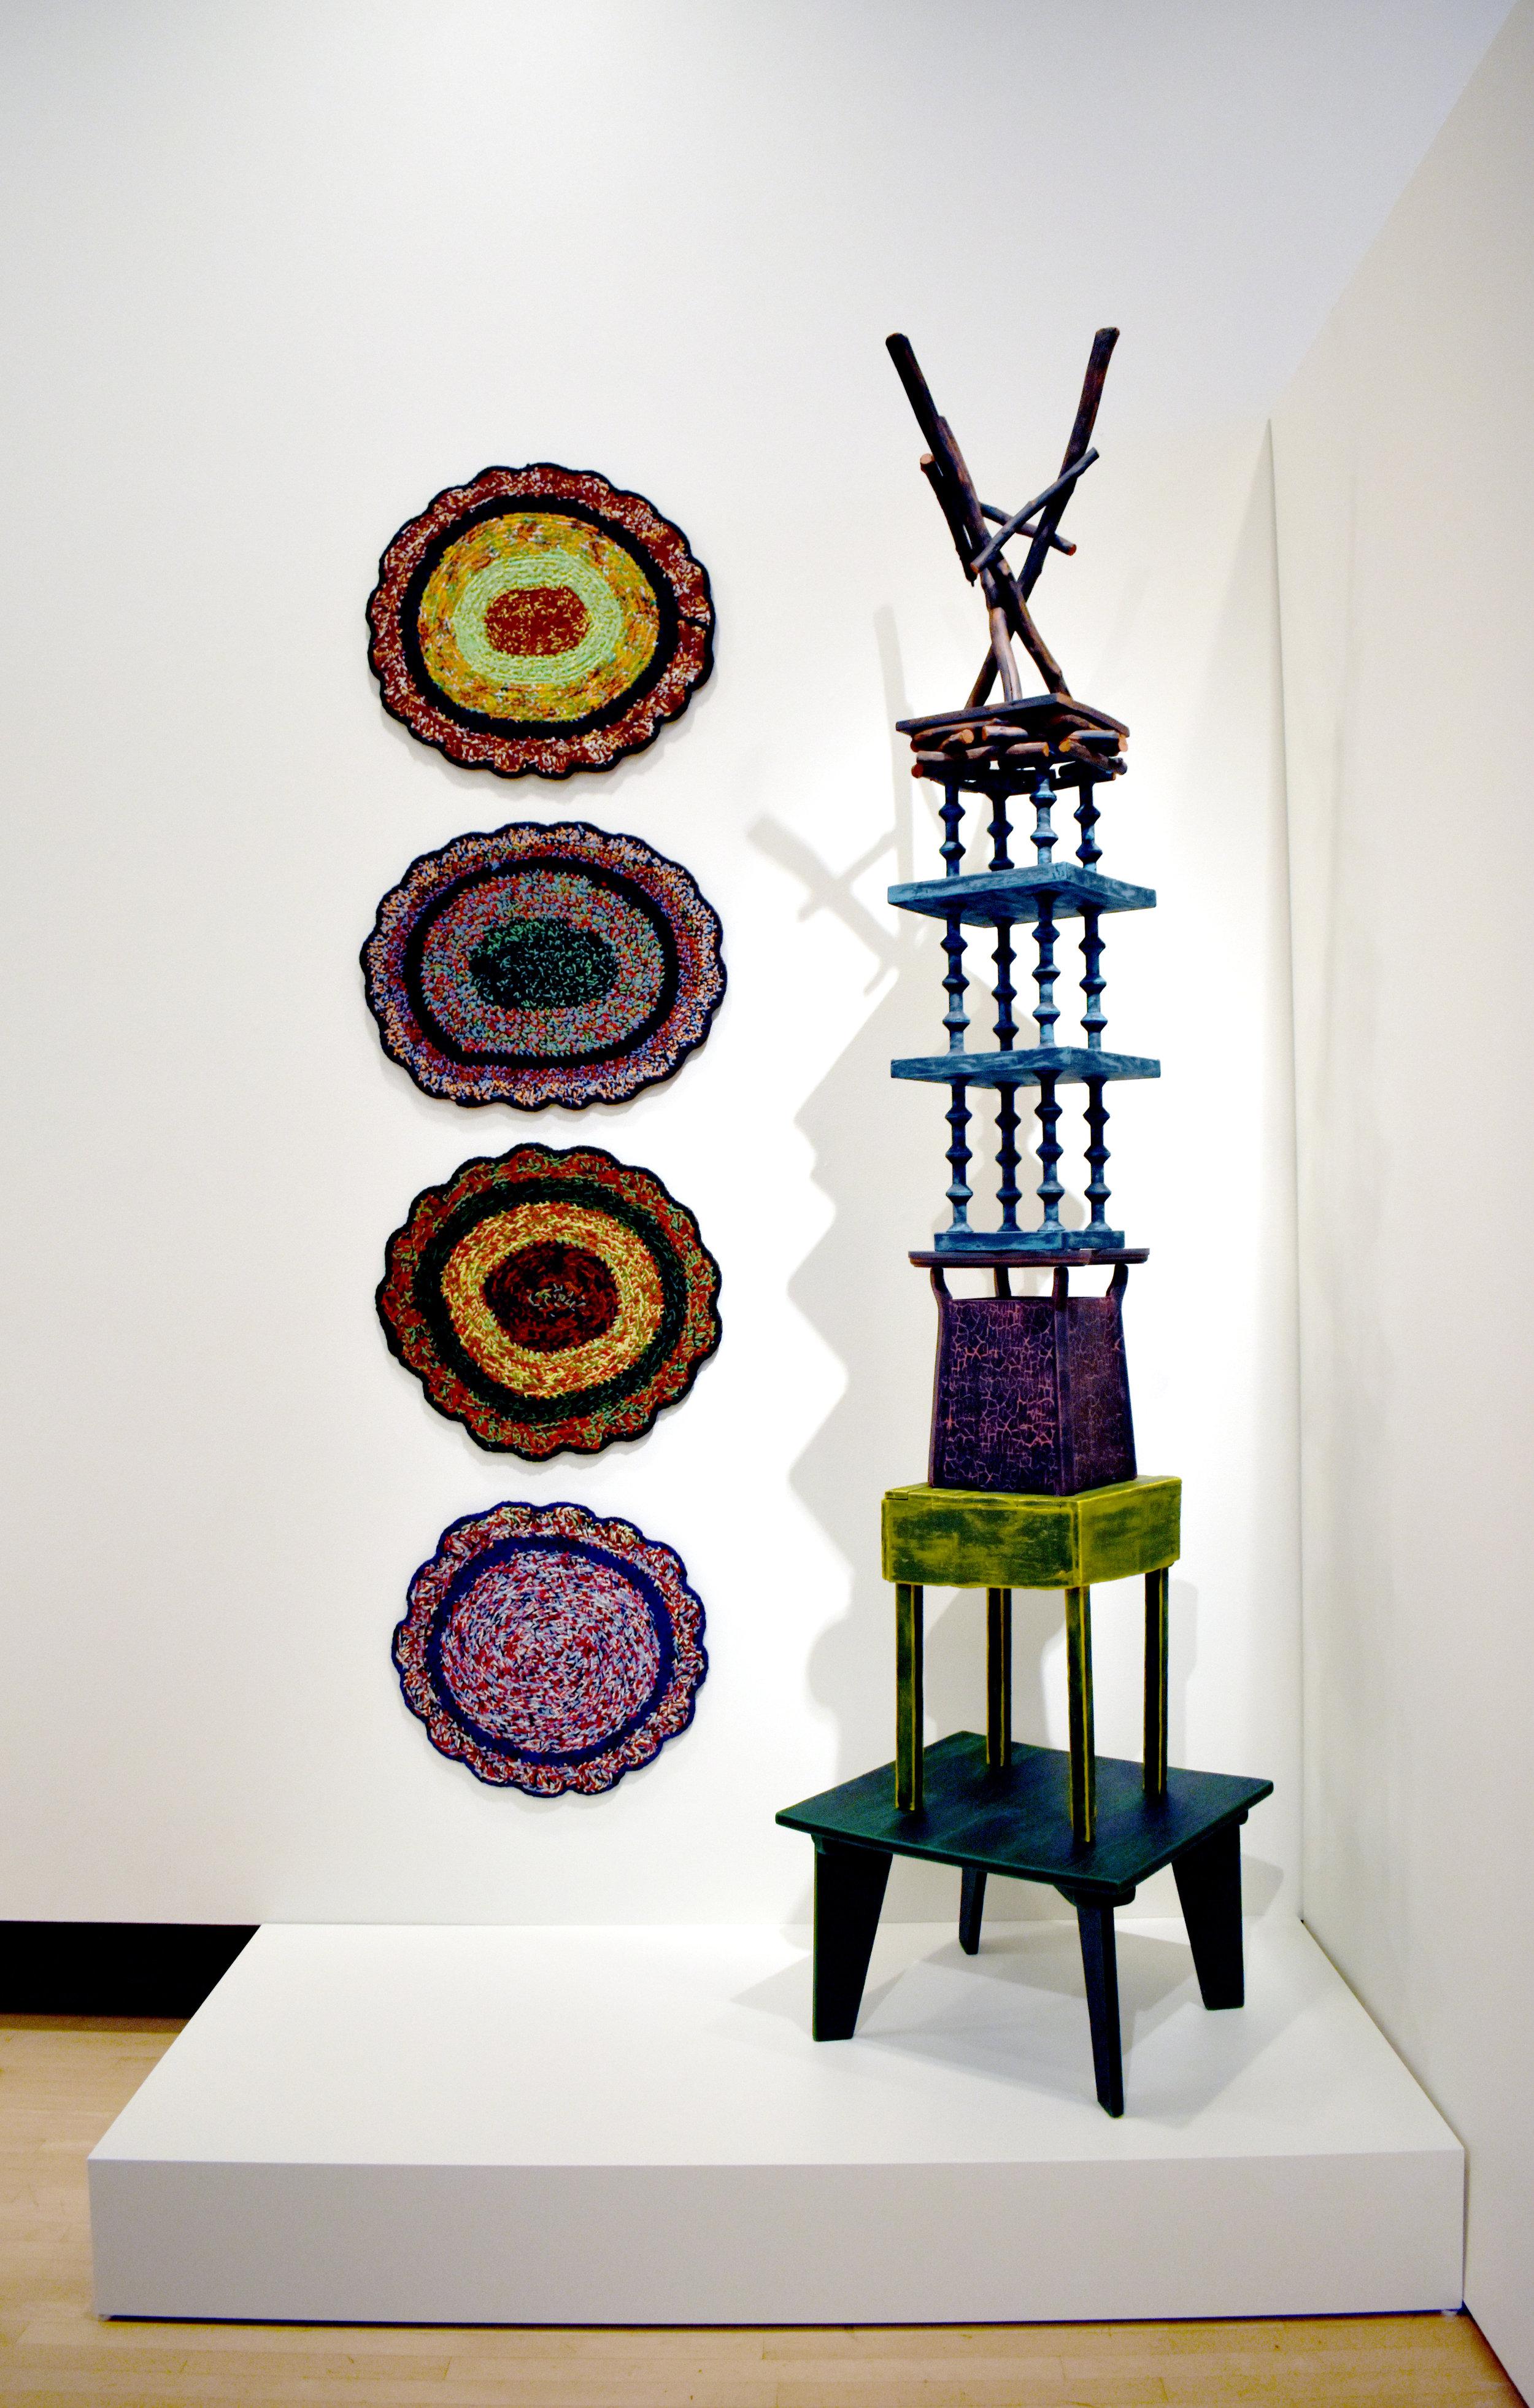 Sharon Bates,  Tall Yarn ;  Stacked , 2018, Installation view